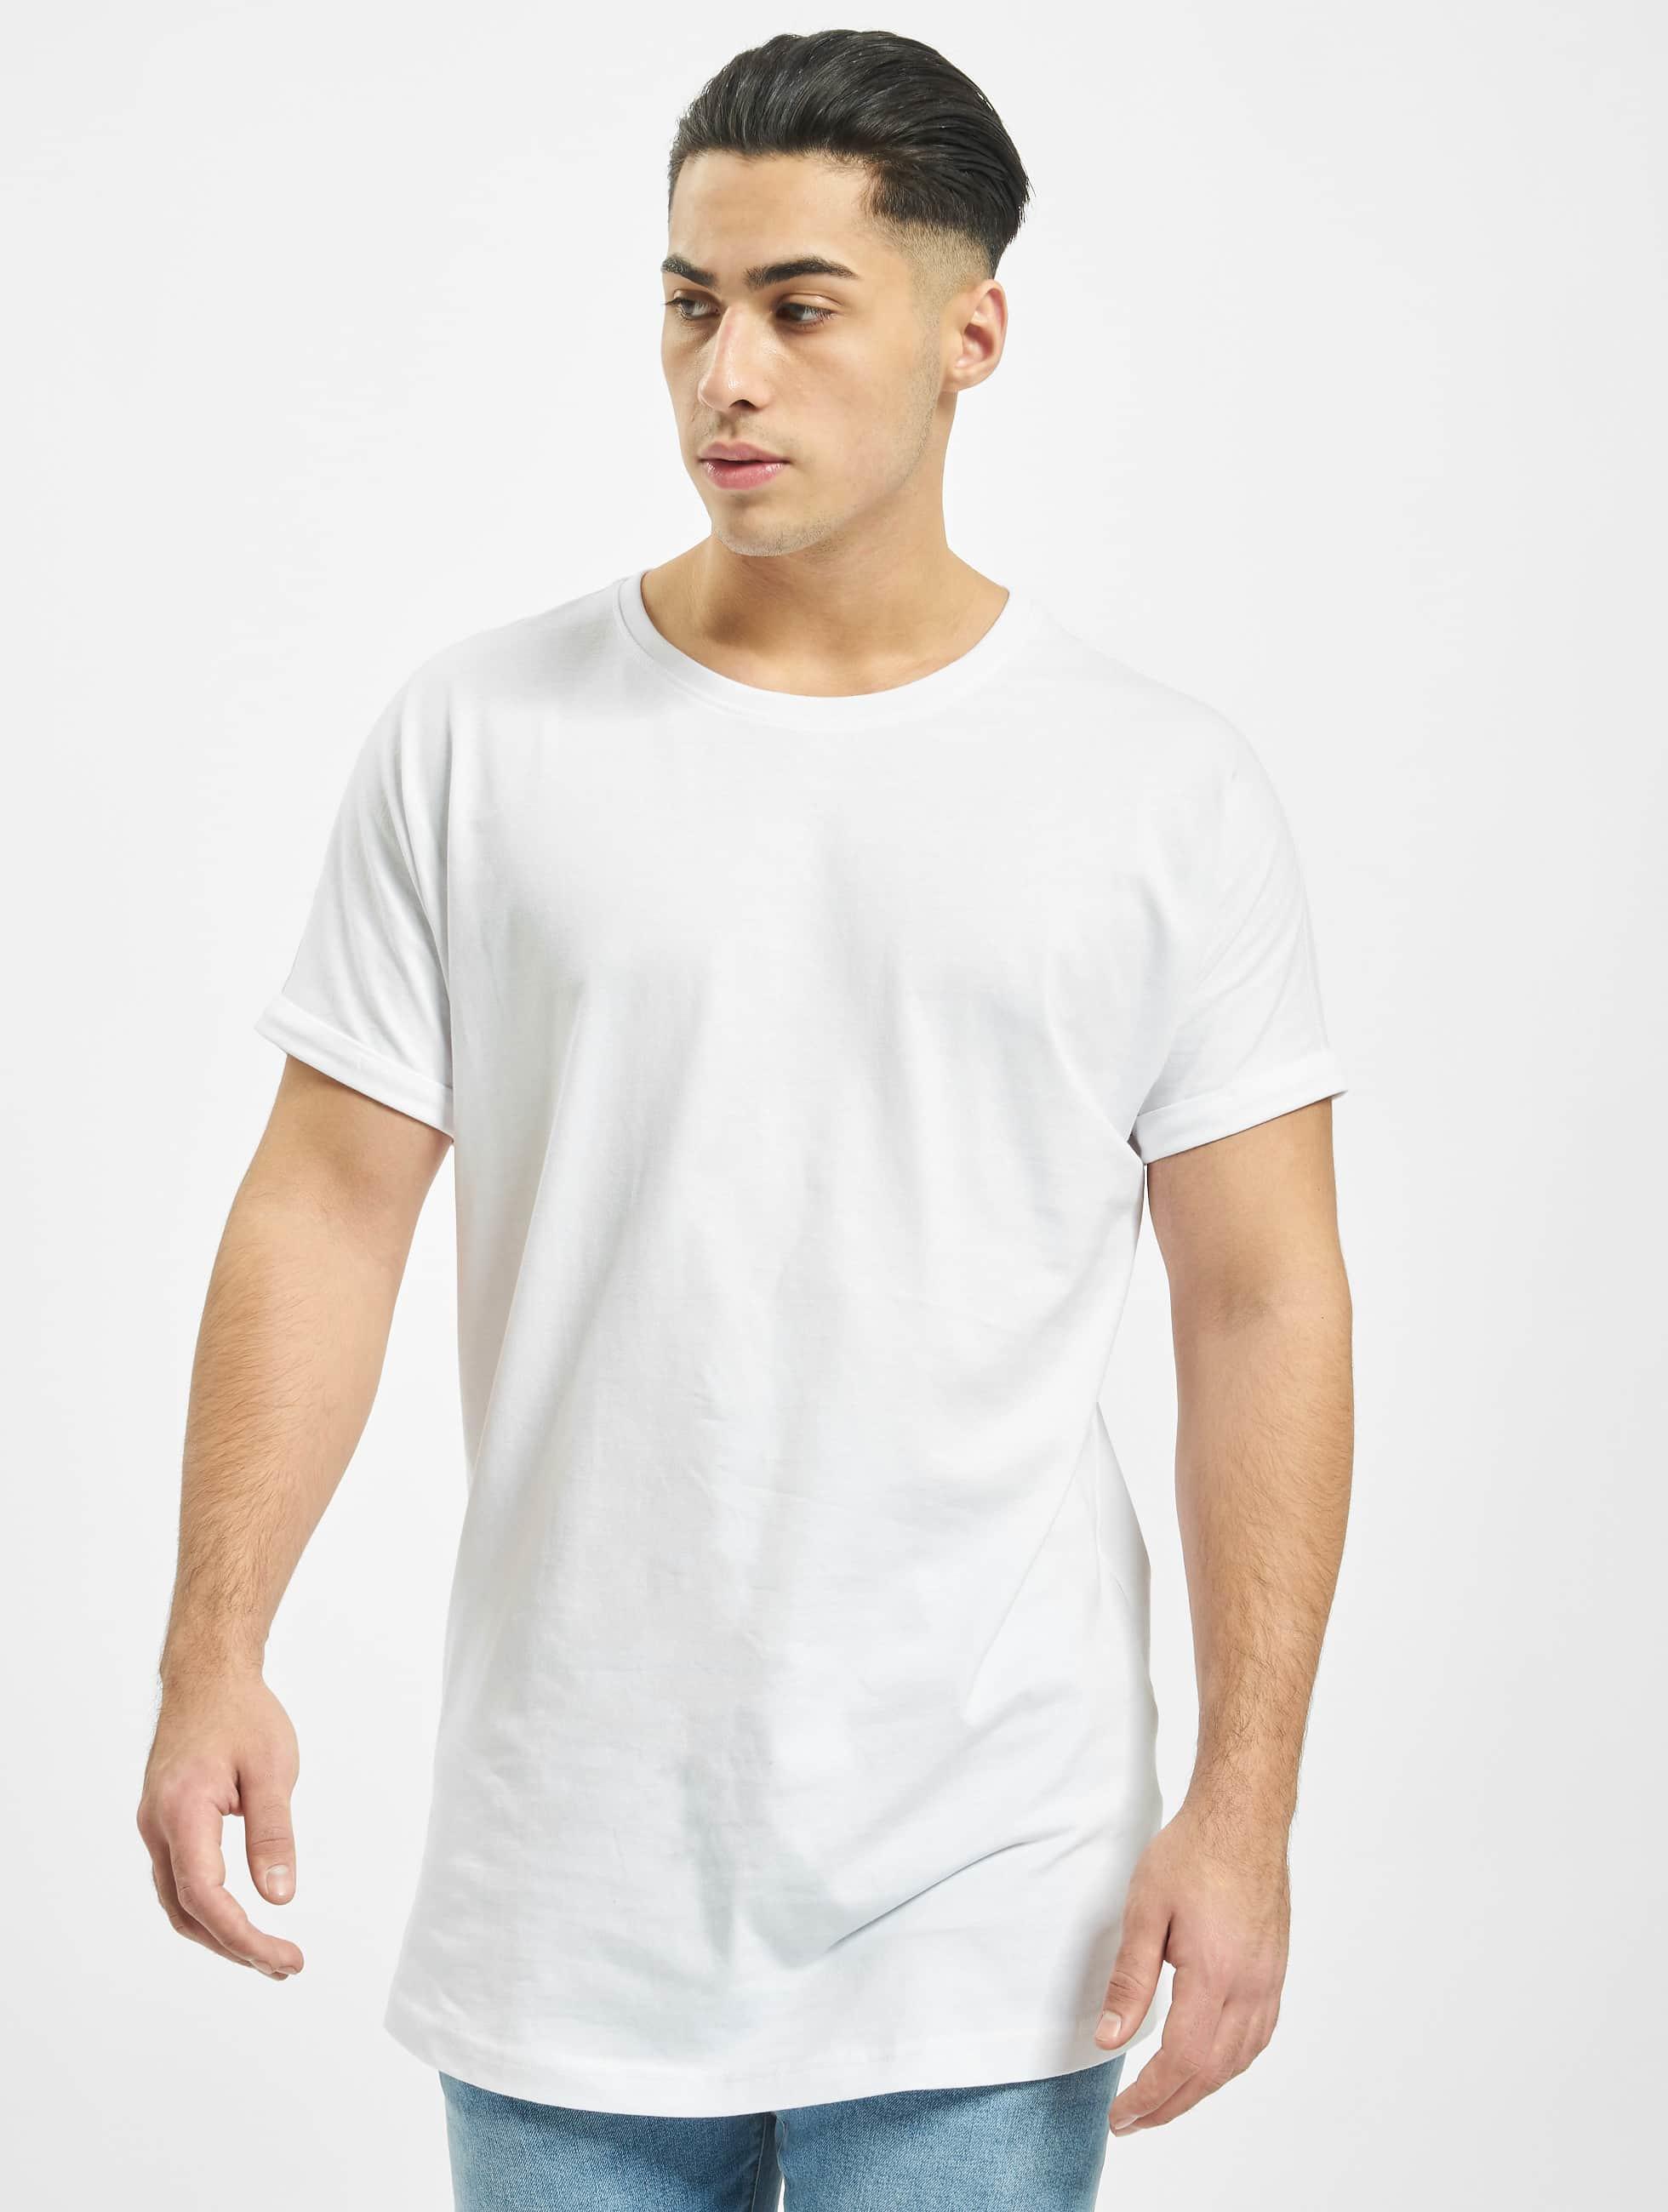 ... Urban Classics bovenstuk / t-shirt Long Shaped Turnup in wit ...